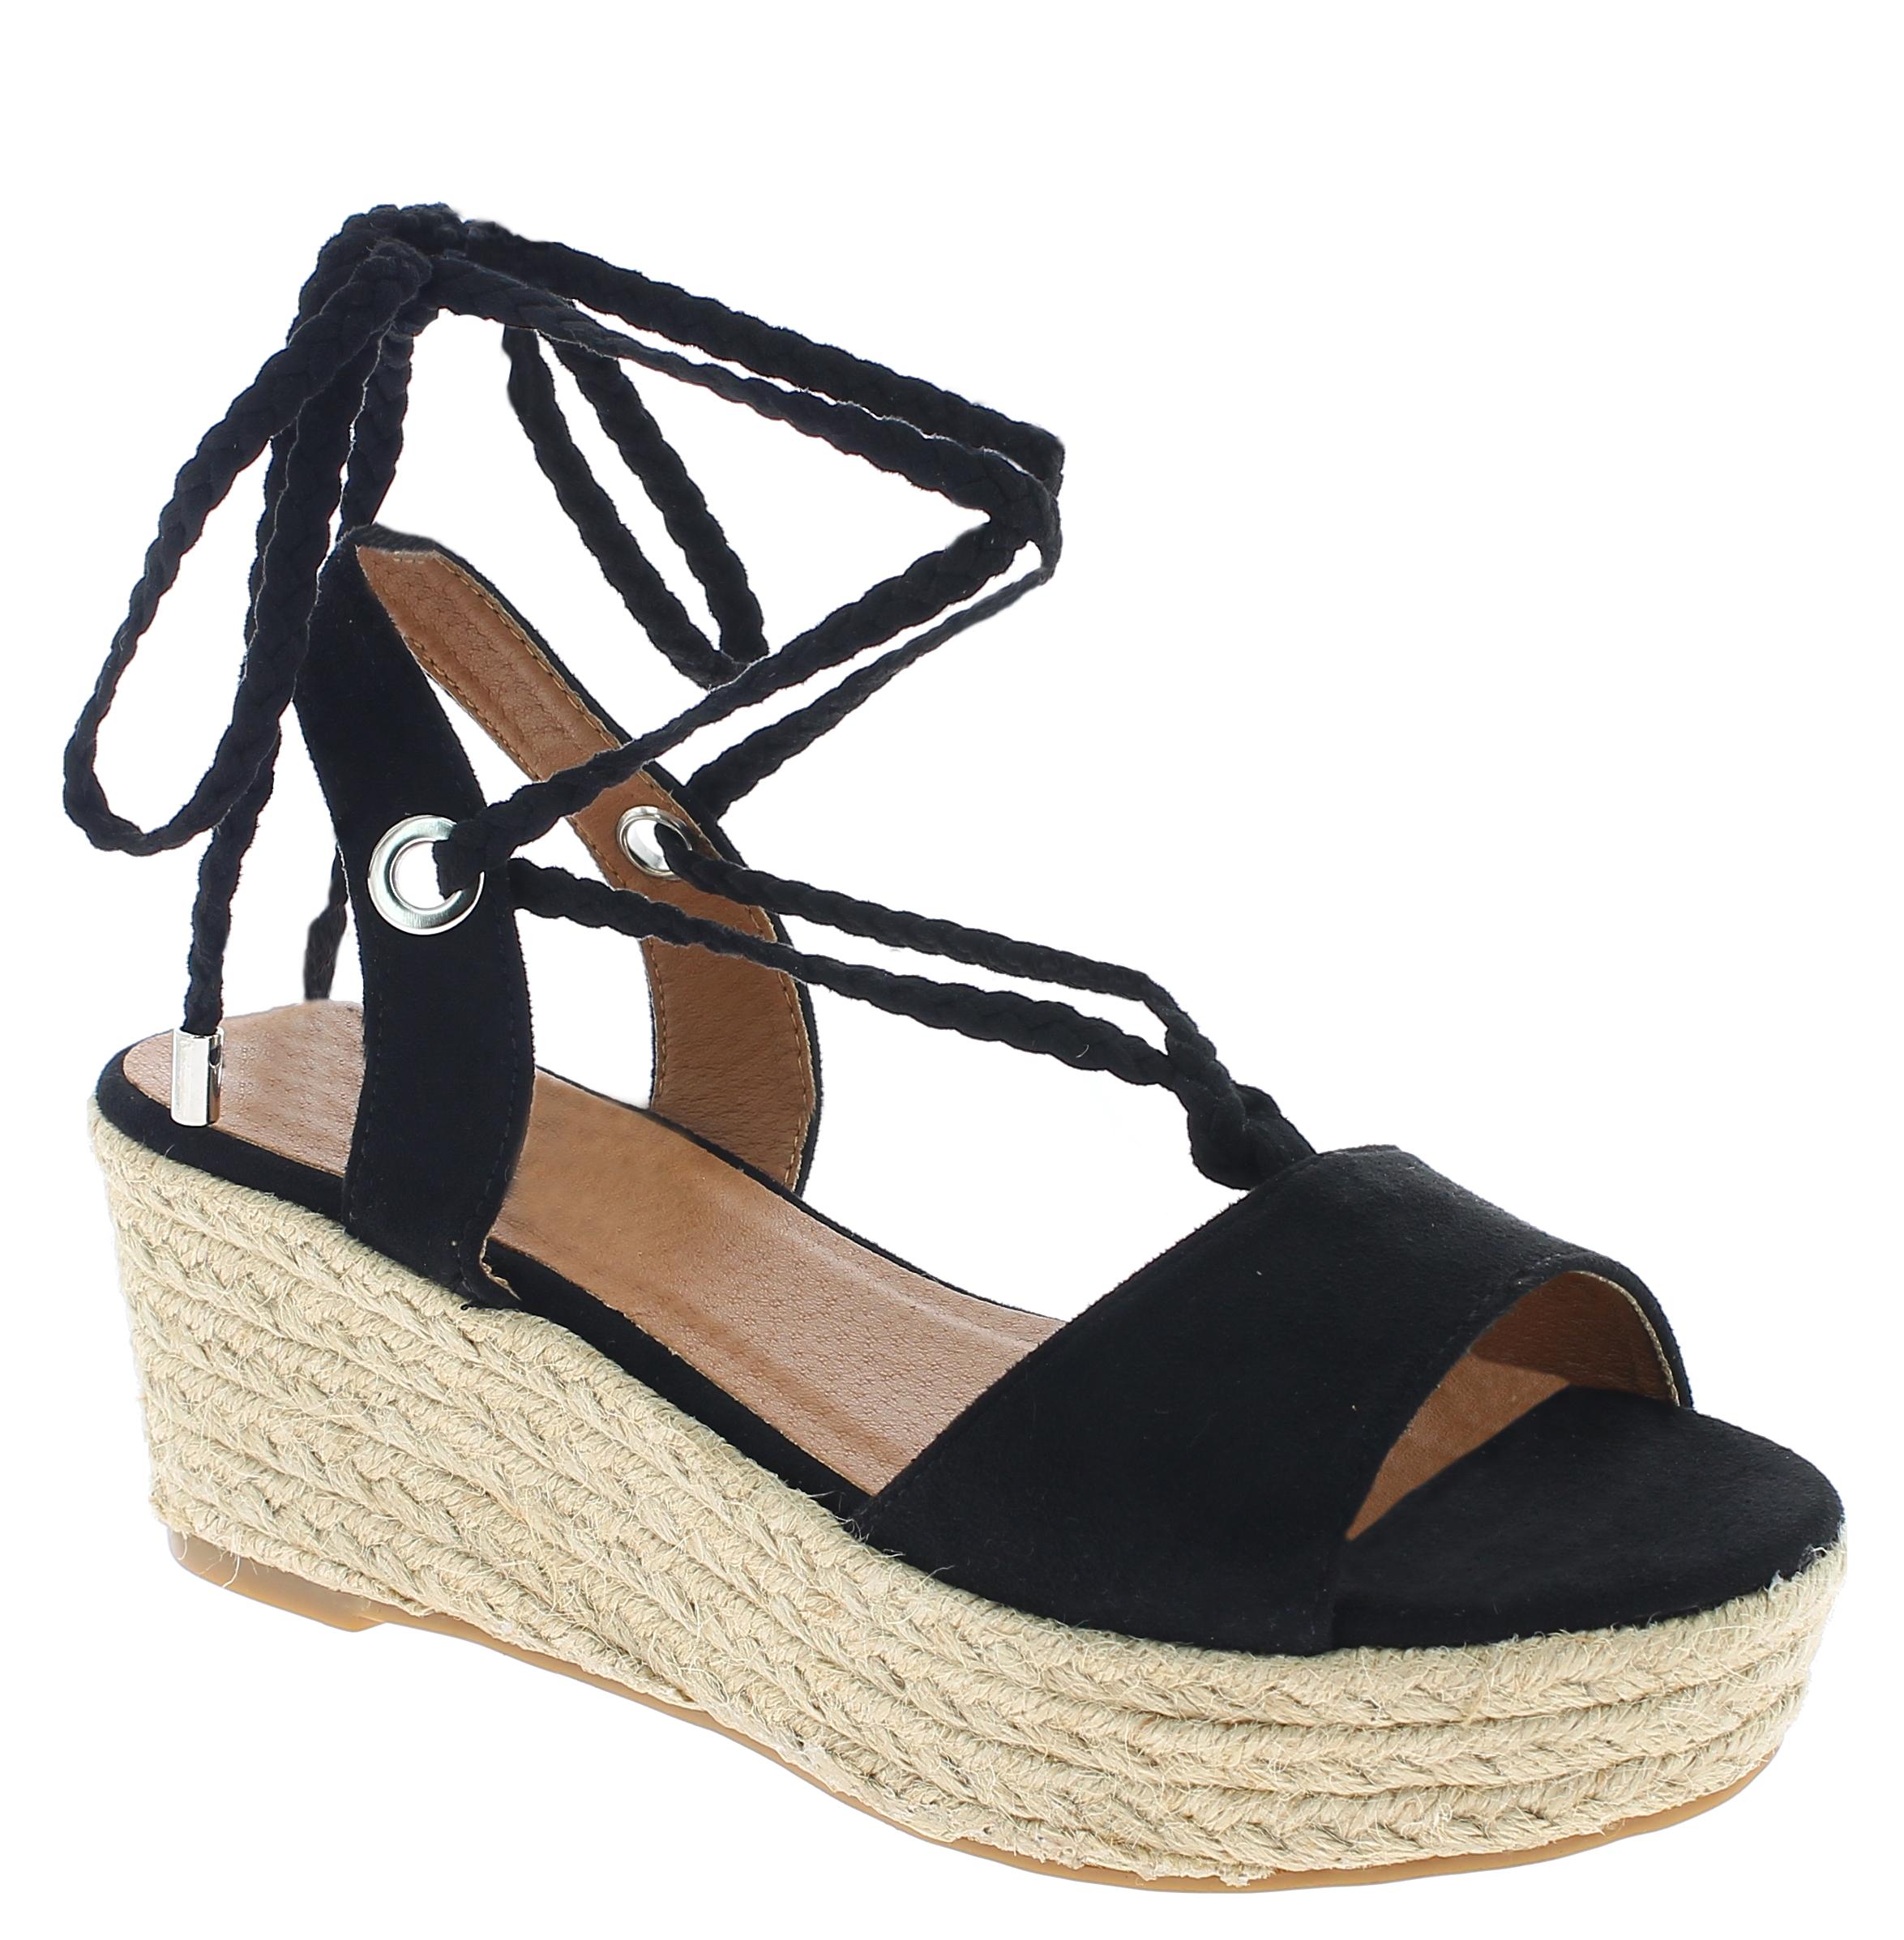 IQSHOES Γυναικεία Πλατφόρμα 3A363 Μαύρο - IqShoes - 3A363 BLACK-black-36/1/15/7 παπούτσια  πέδιλα